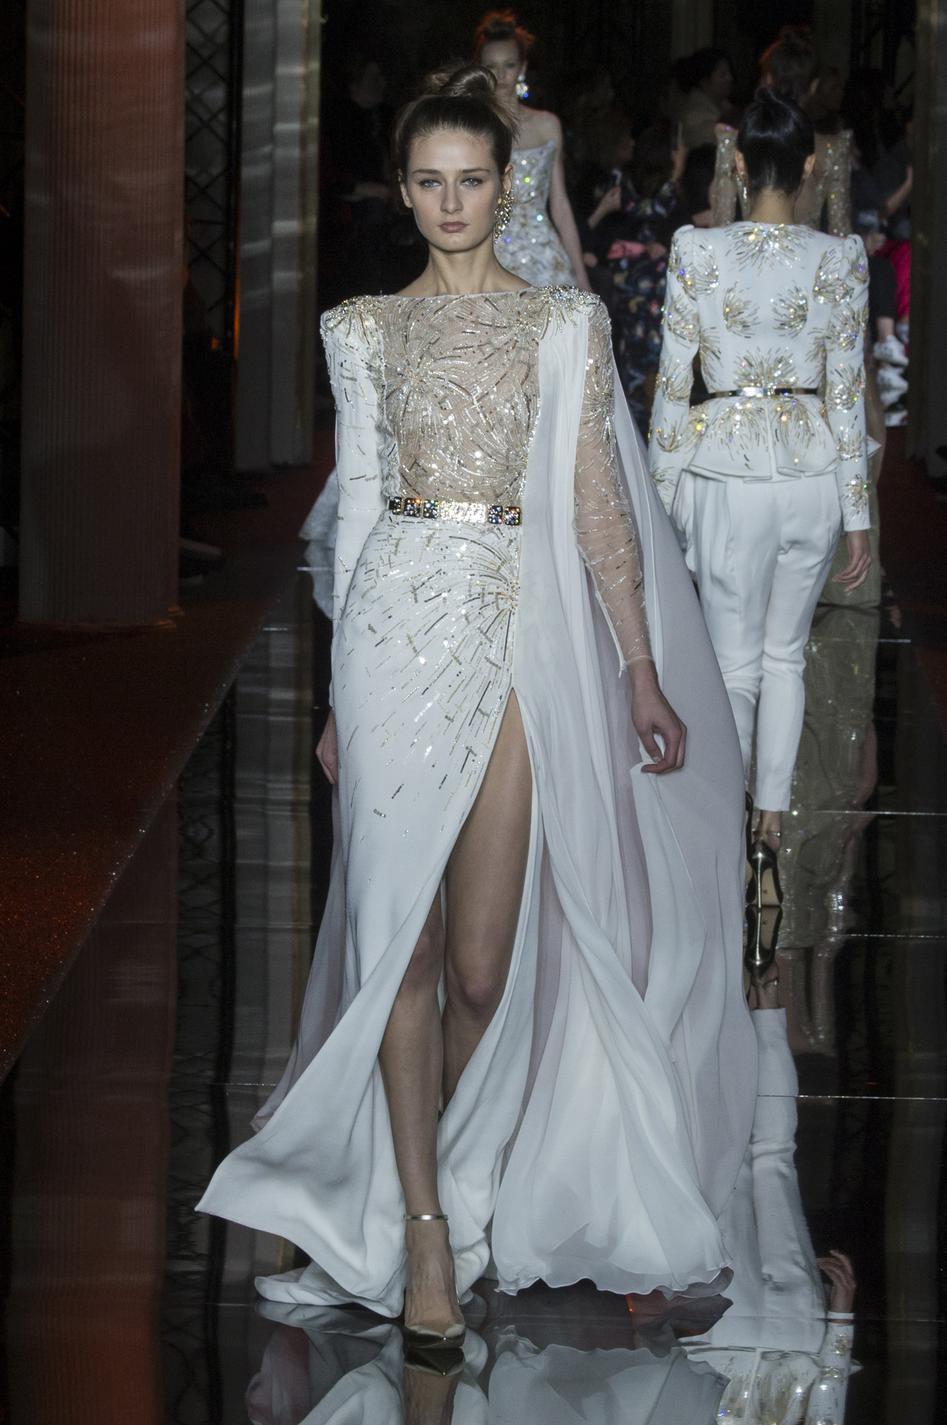 chanel dior elie saab les plus belles robes couture printemps t 2017 madame figaro. Black Bedroom Furniture Sets. Home Design Ideas